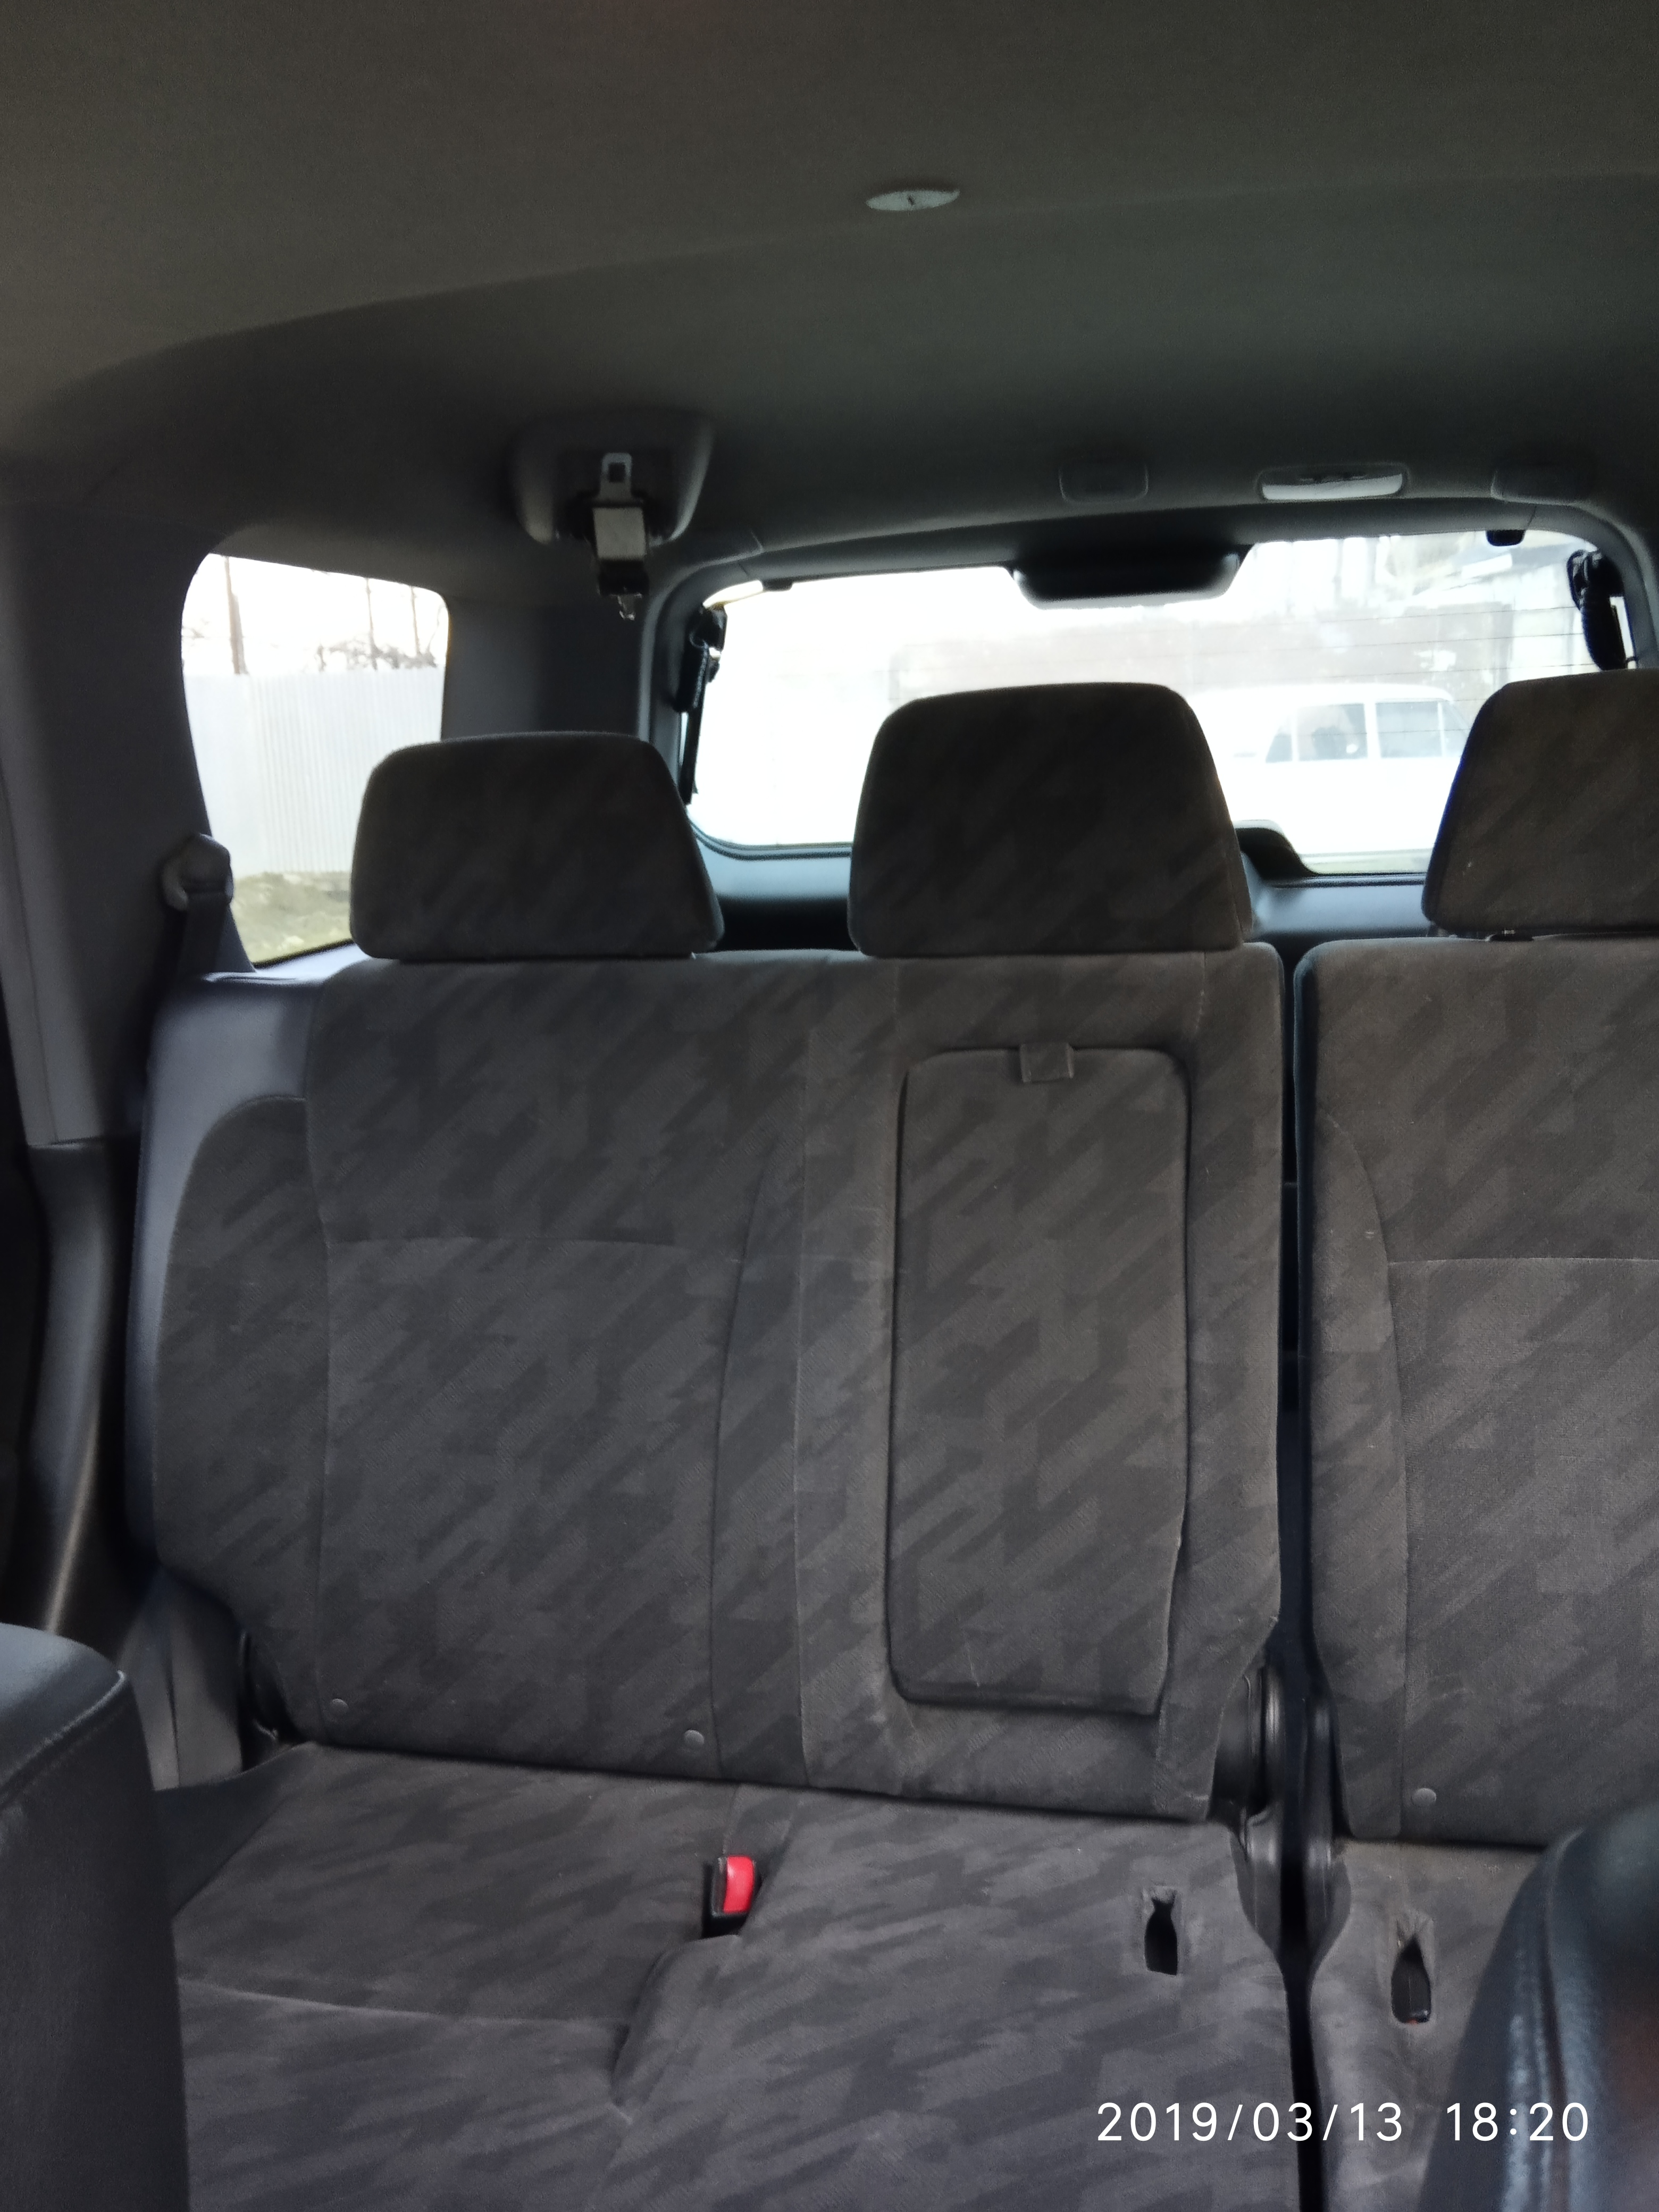 Honda CR-V 2.4(lt) 2001 Подержанный  $8200